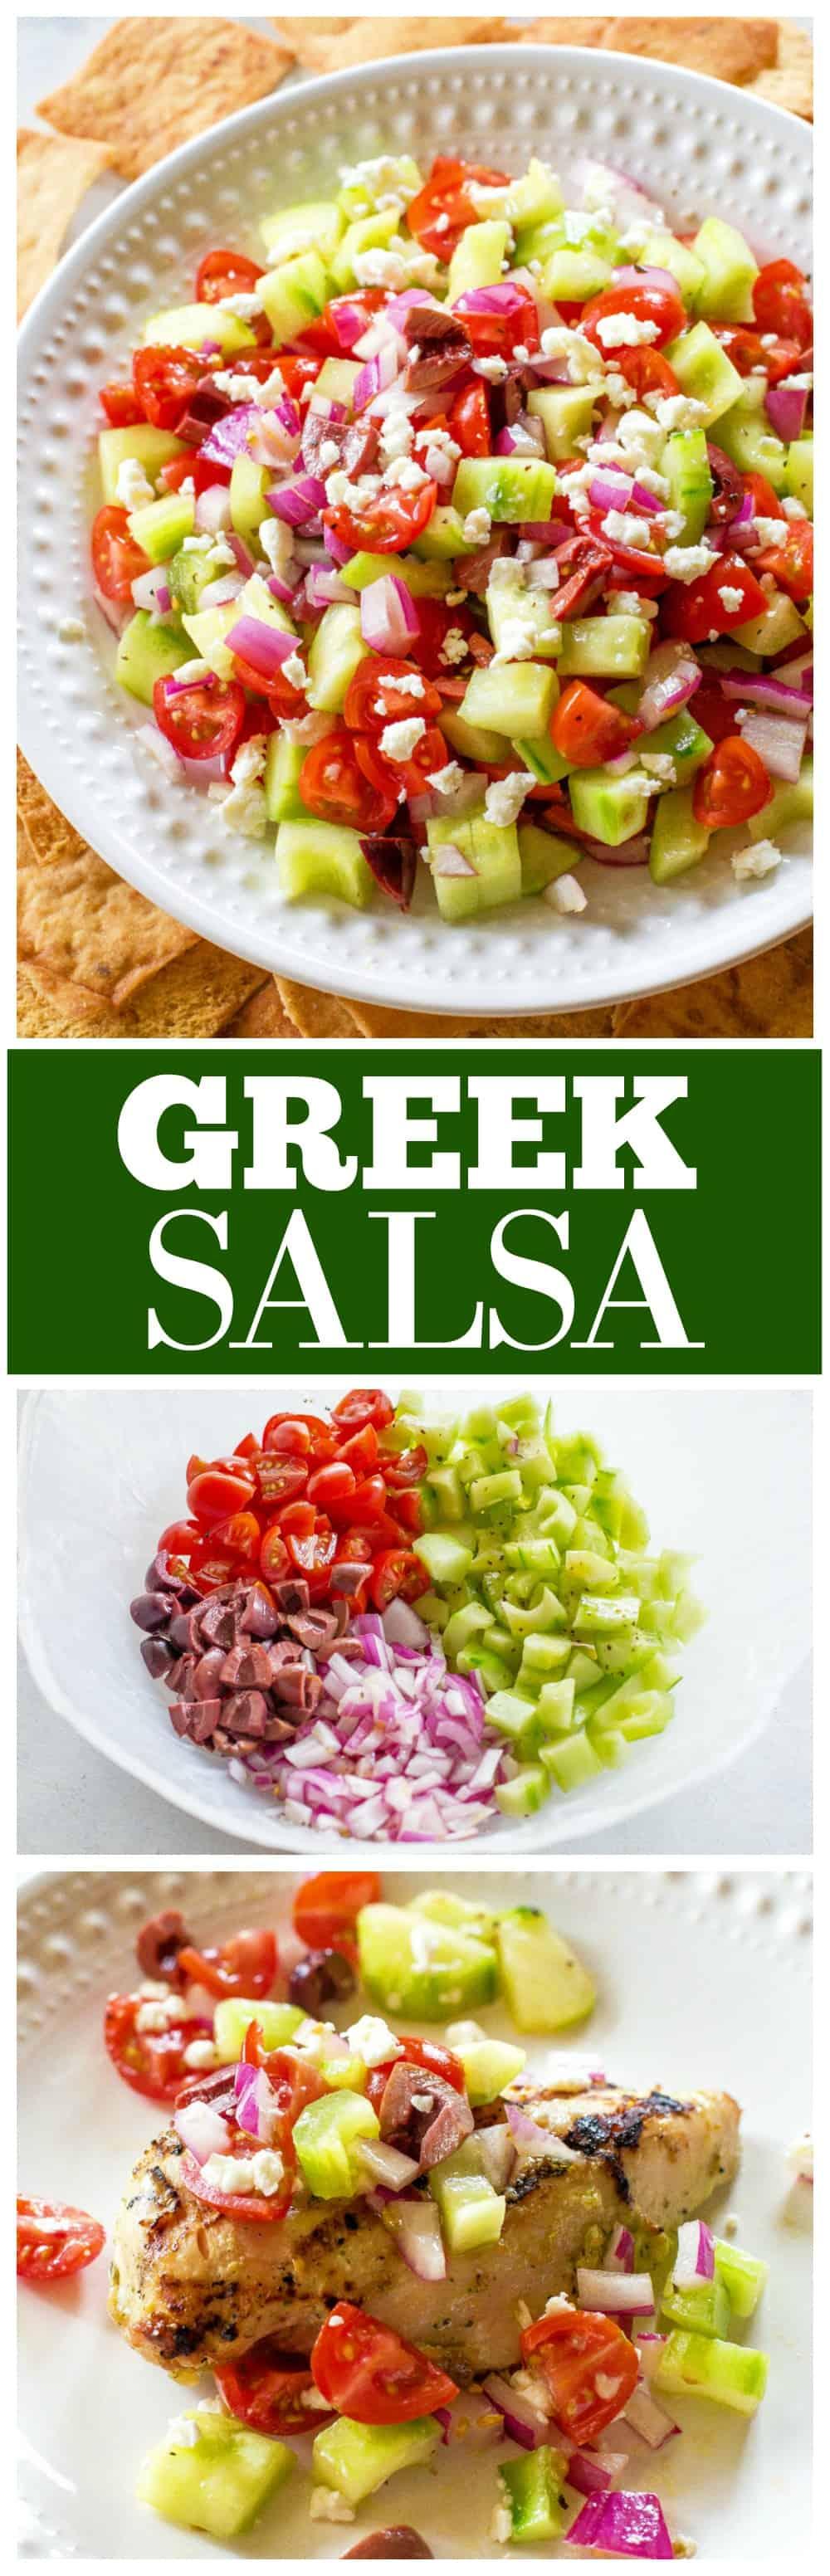 Greek Salsa with pita chips